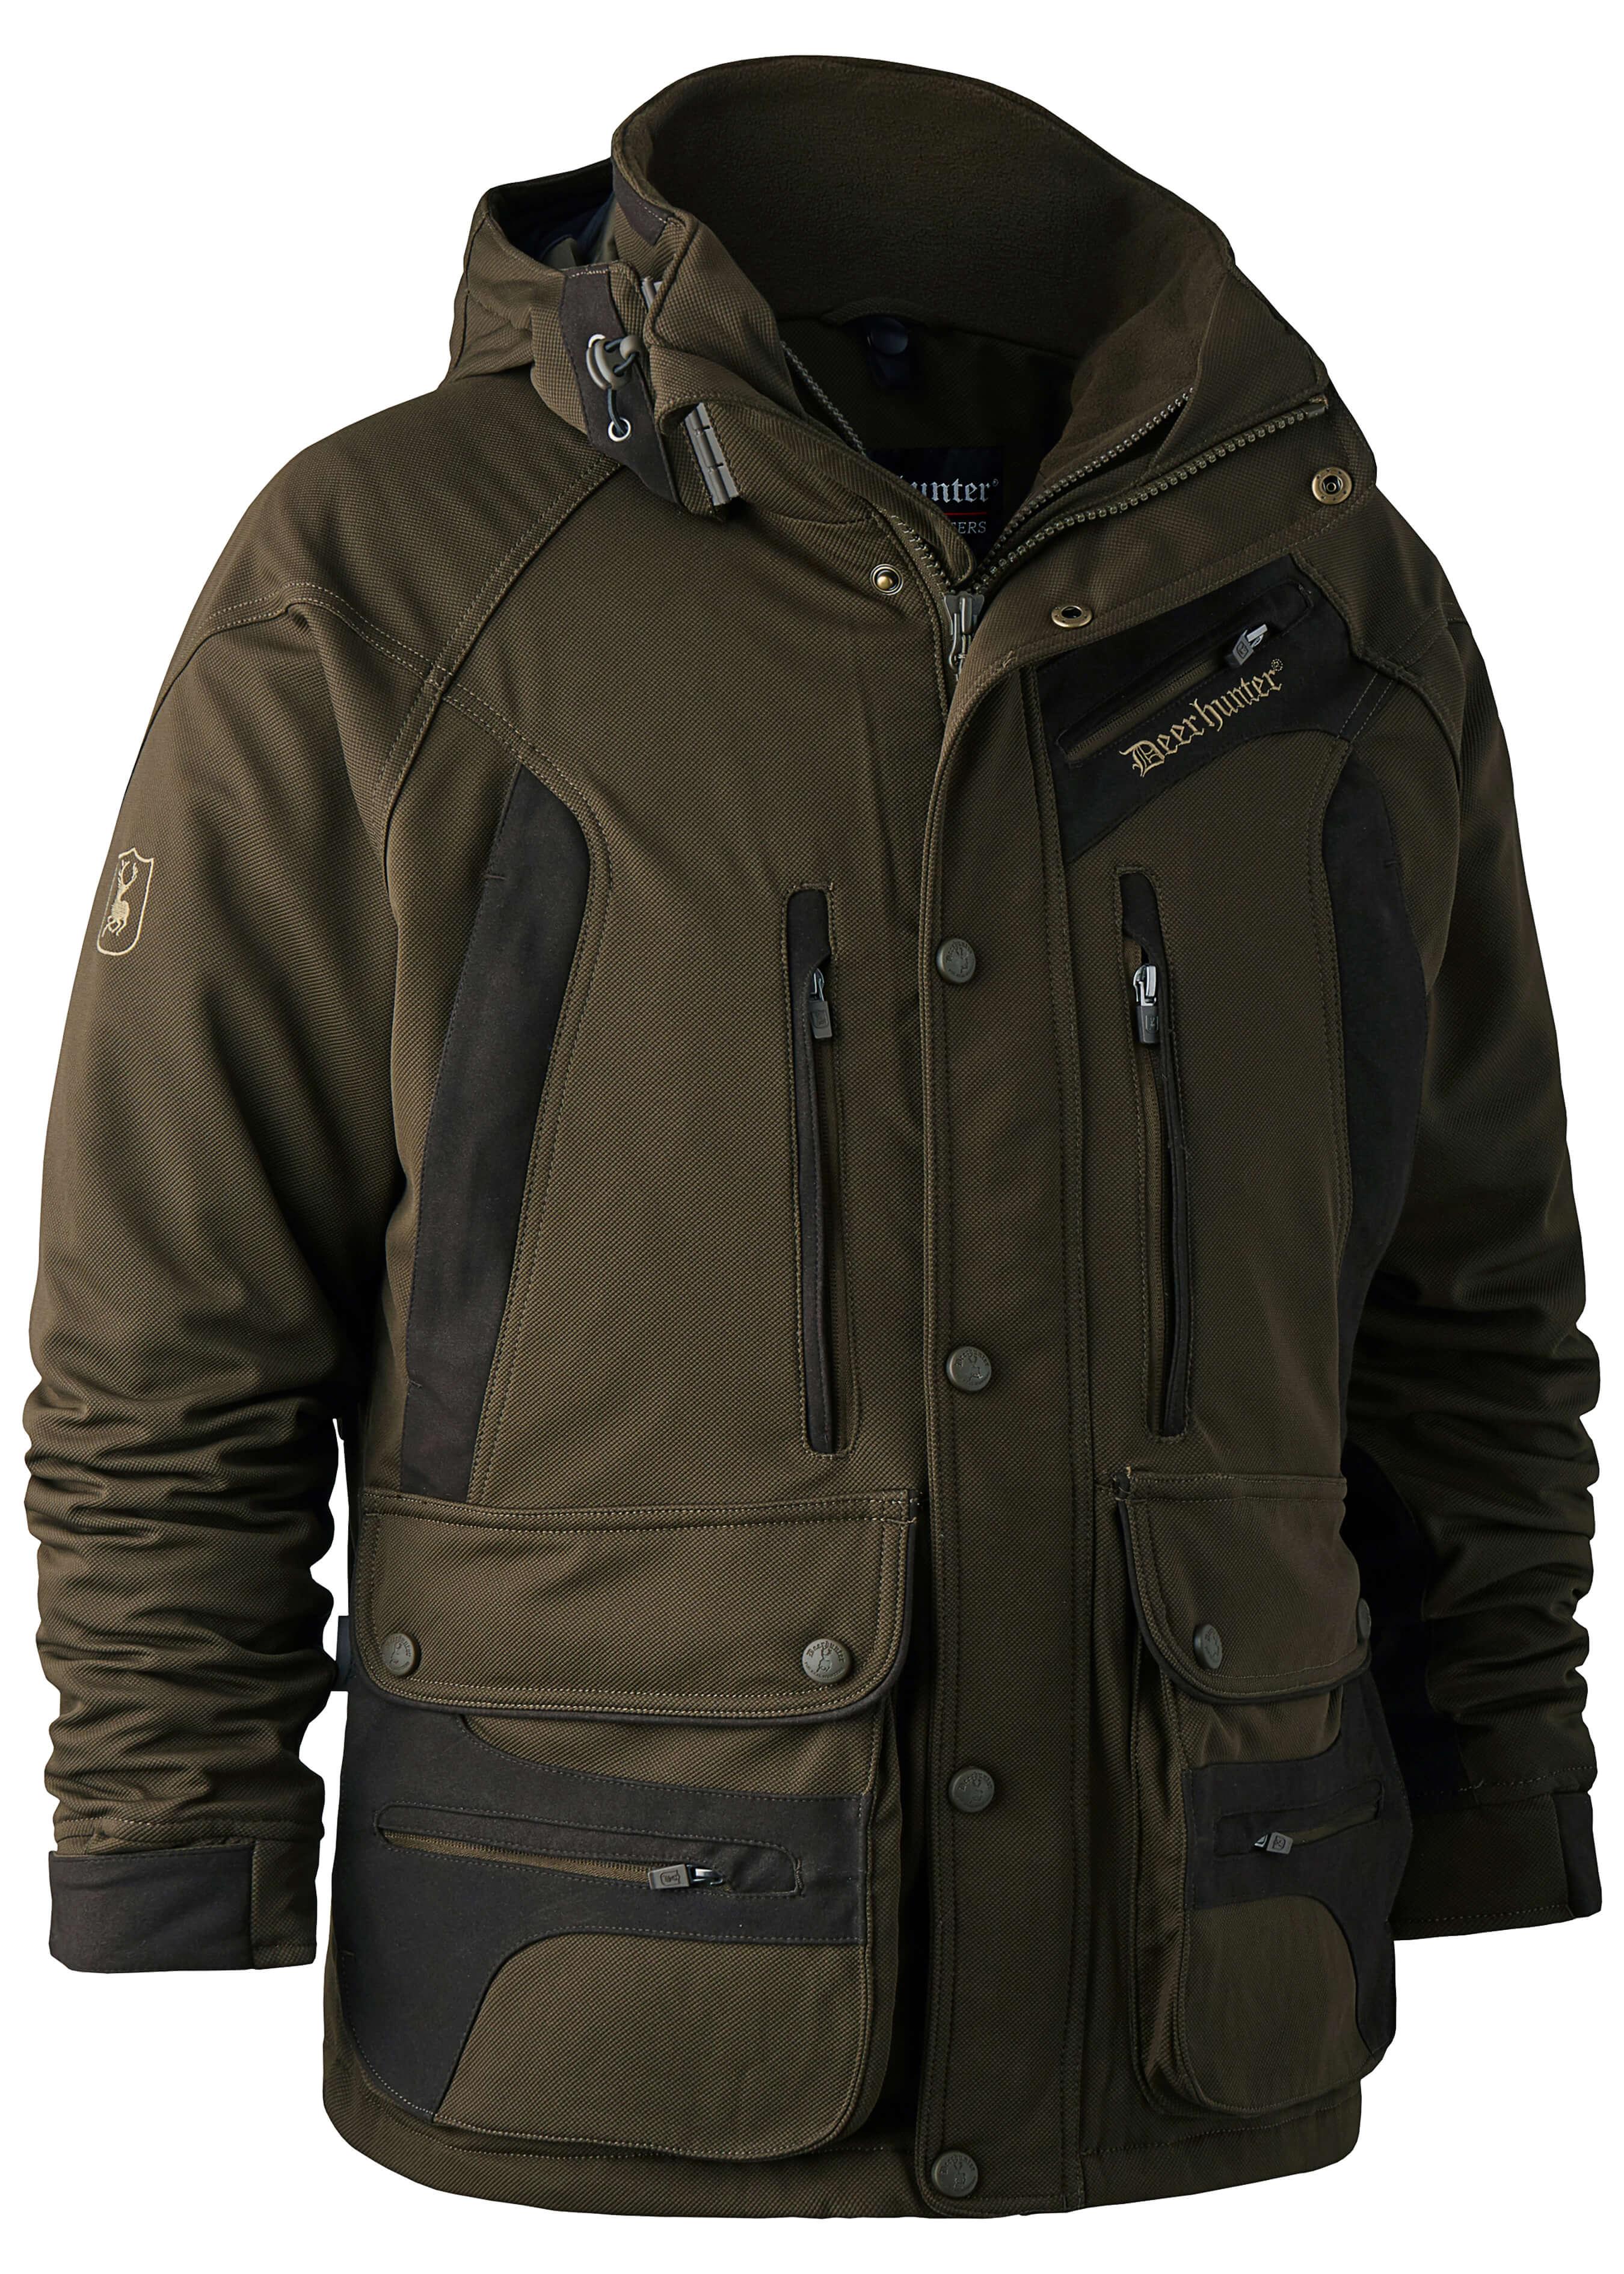 Deerhunter Winter Jagdjacke und Outdoorjacke Muflon 15542448 1